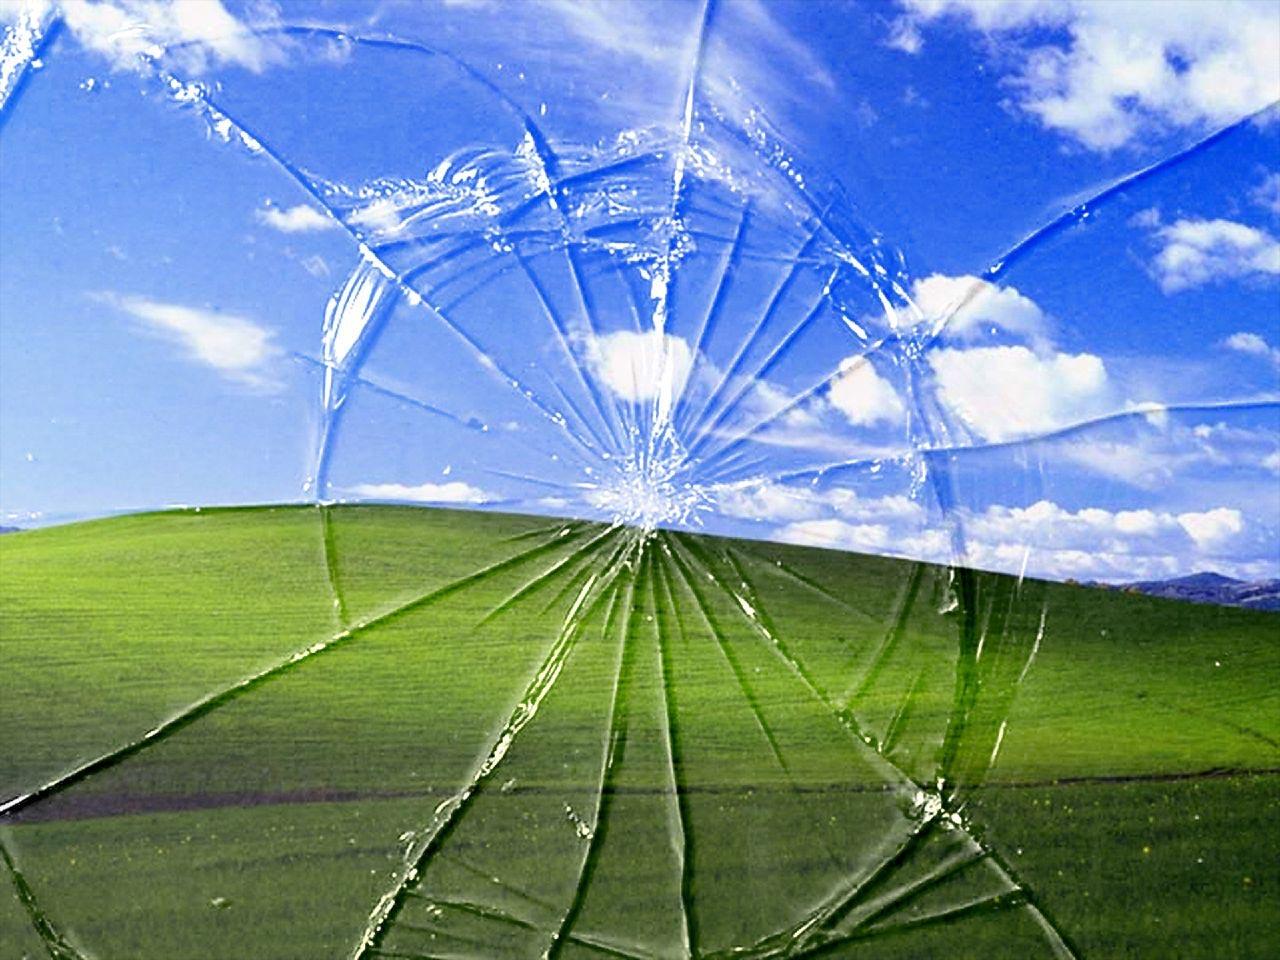 http://4.bp.blogspot.com/_nhnFs7fKSAQ/THhhG_VK1iI/AAAAAAAAAd4/qrNkdZAyQTQ/s1600/Broken-Screen.jpg